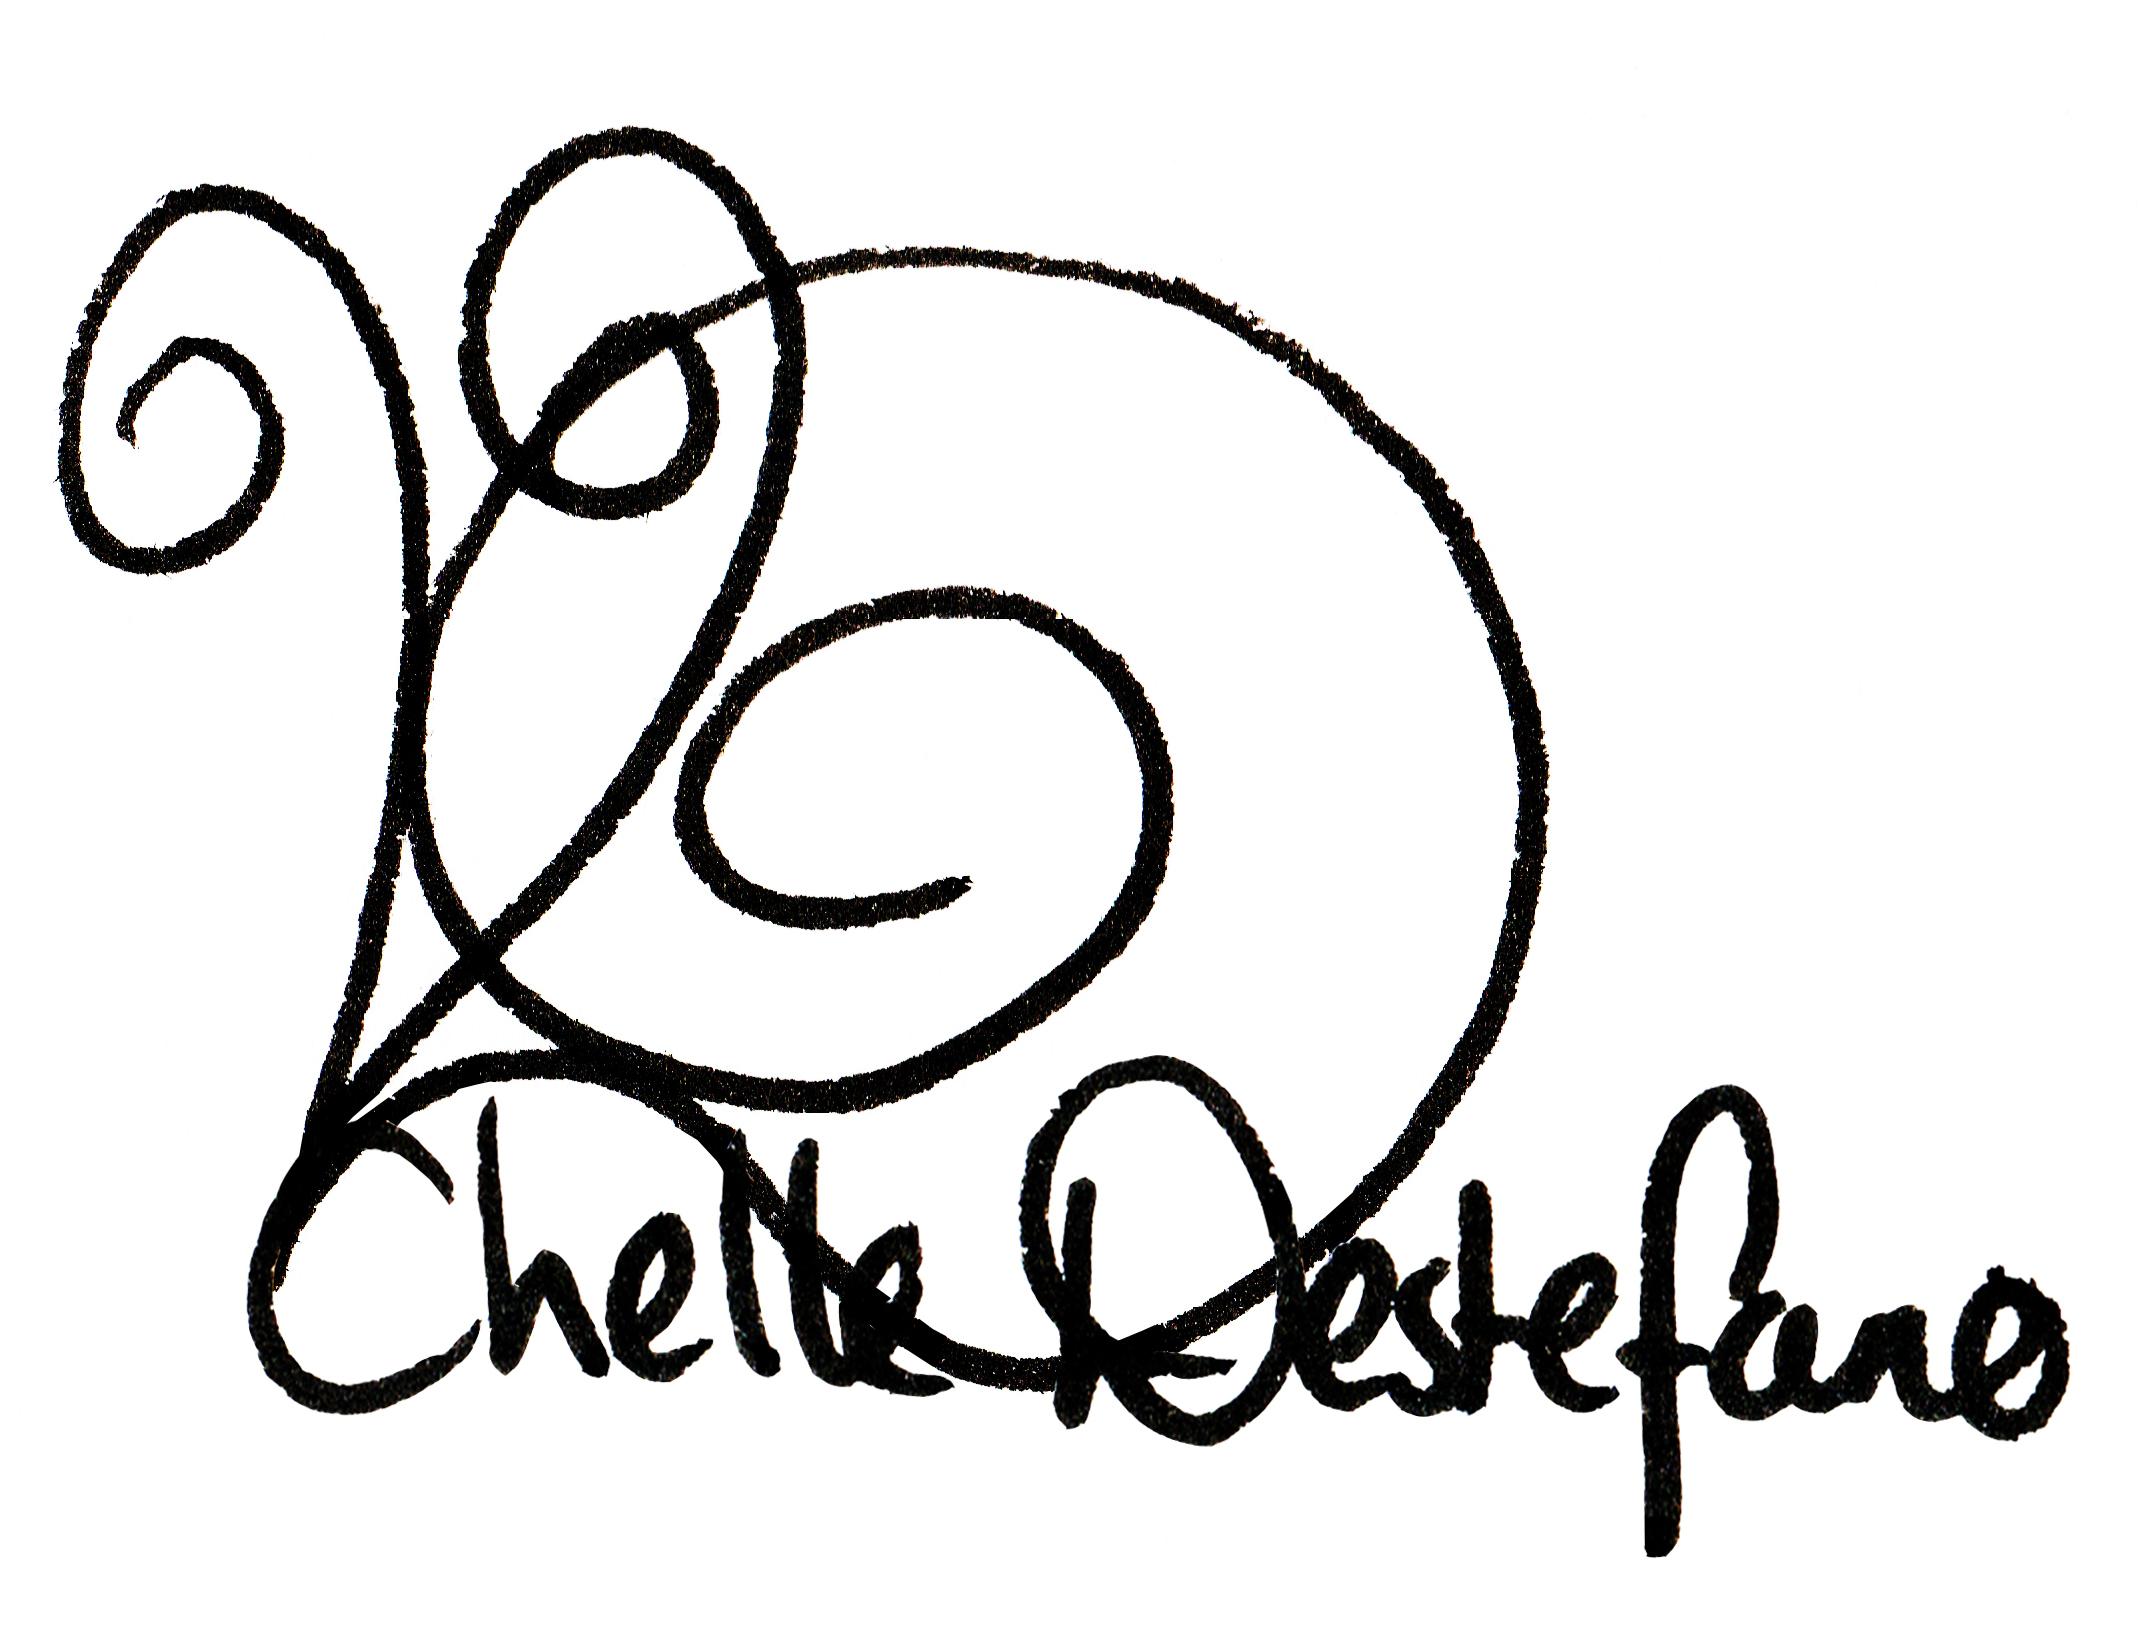 Chelle Destefano Signature